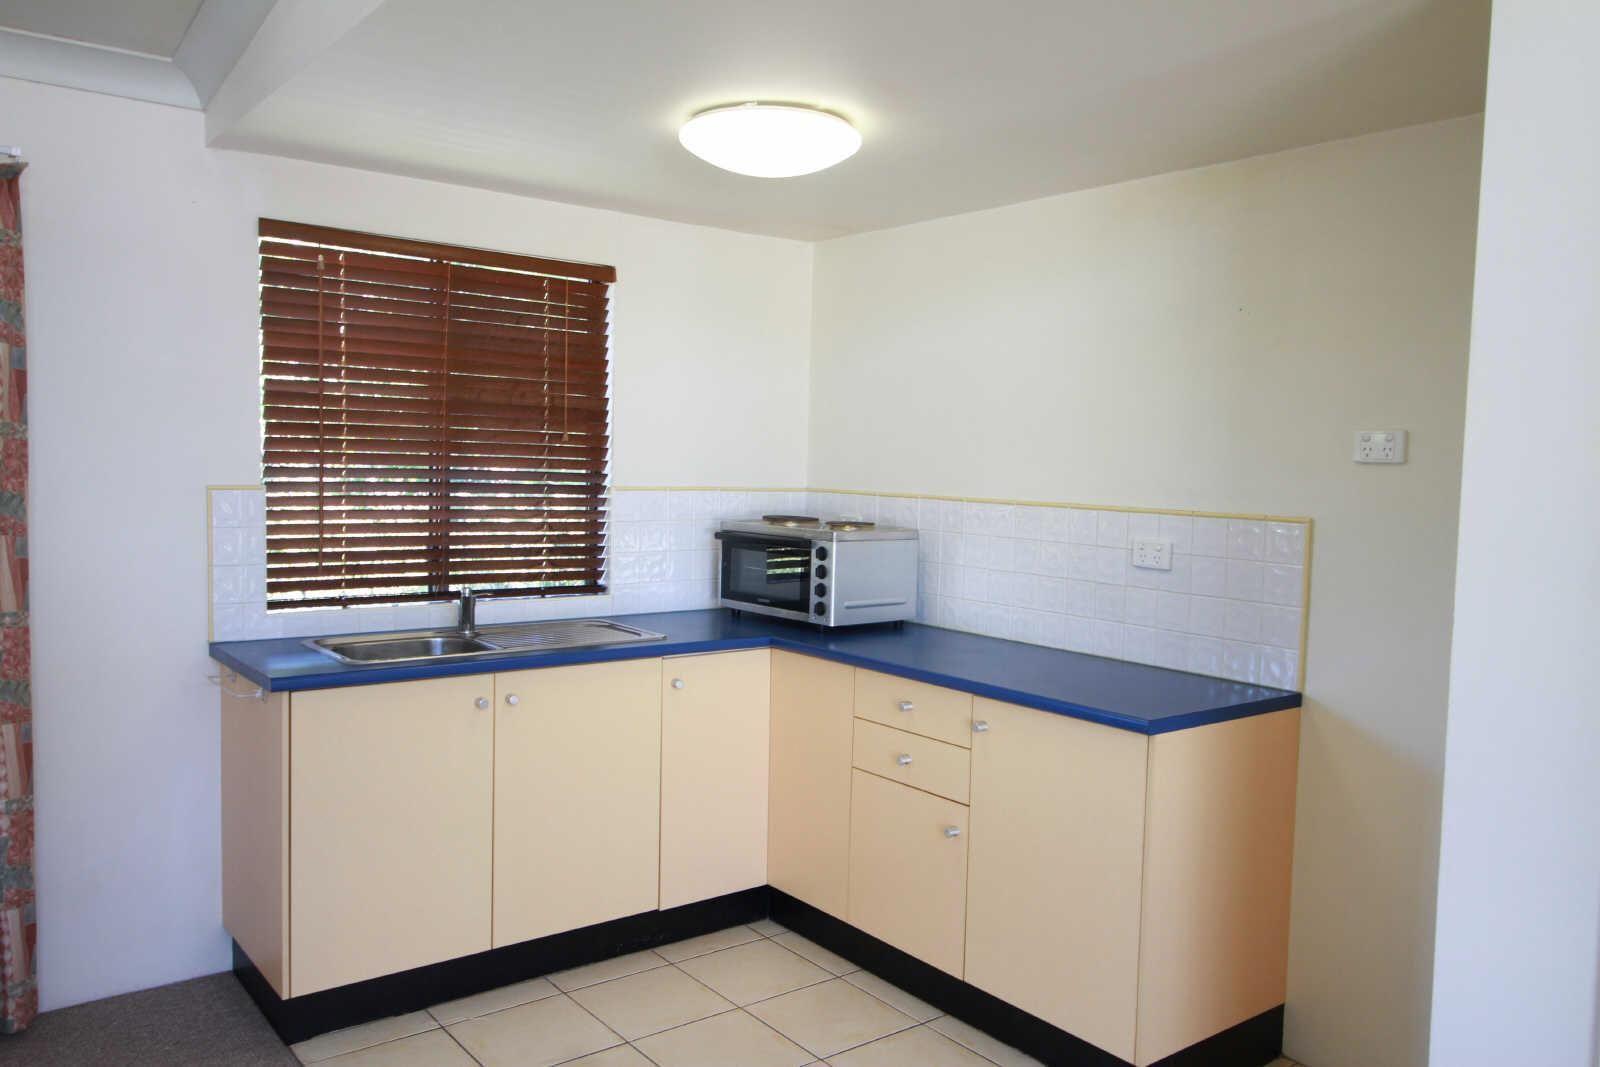 15/91-95 MacIntosh Street, Forster NSW 2428, Image 2